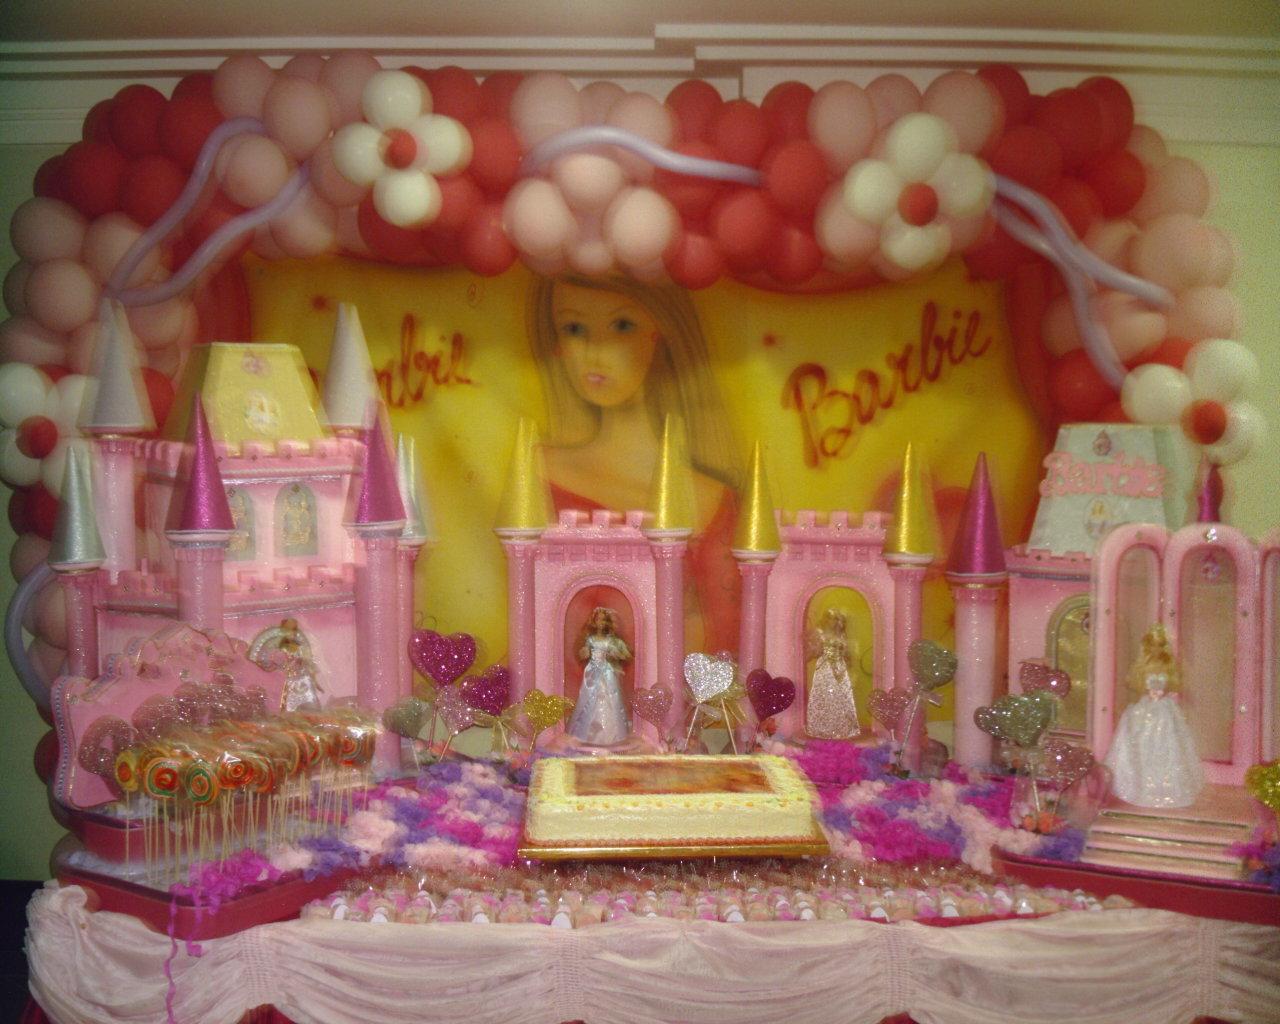 decoracao festa barbie : decoracao festa barbie:Postado por TOY HOUSE BRASILIA FESTAS INFANTIS às 12:35